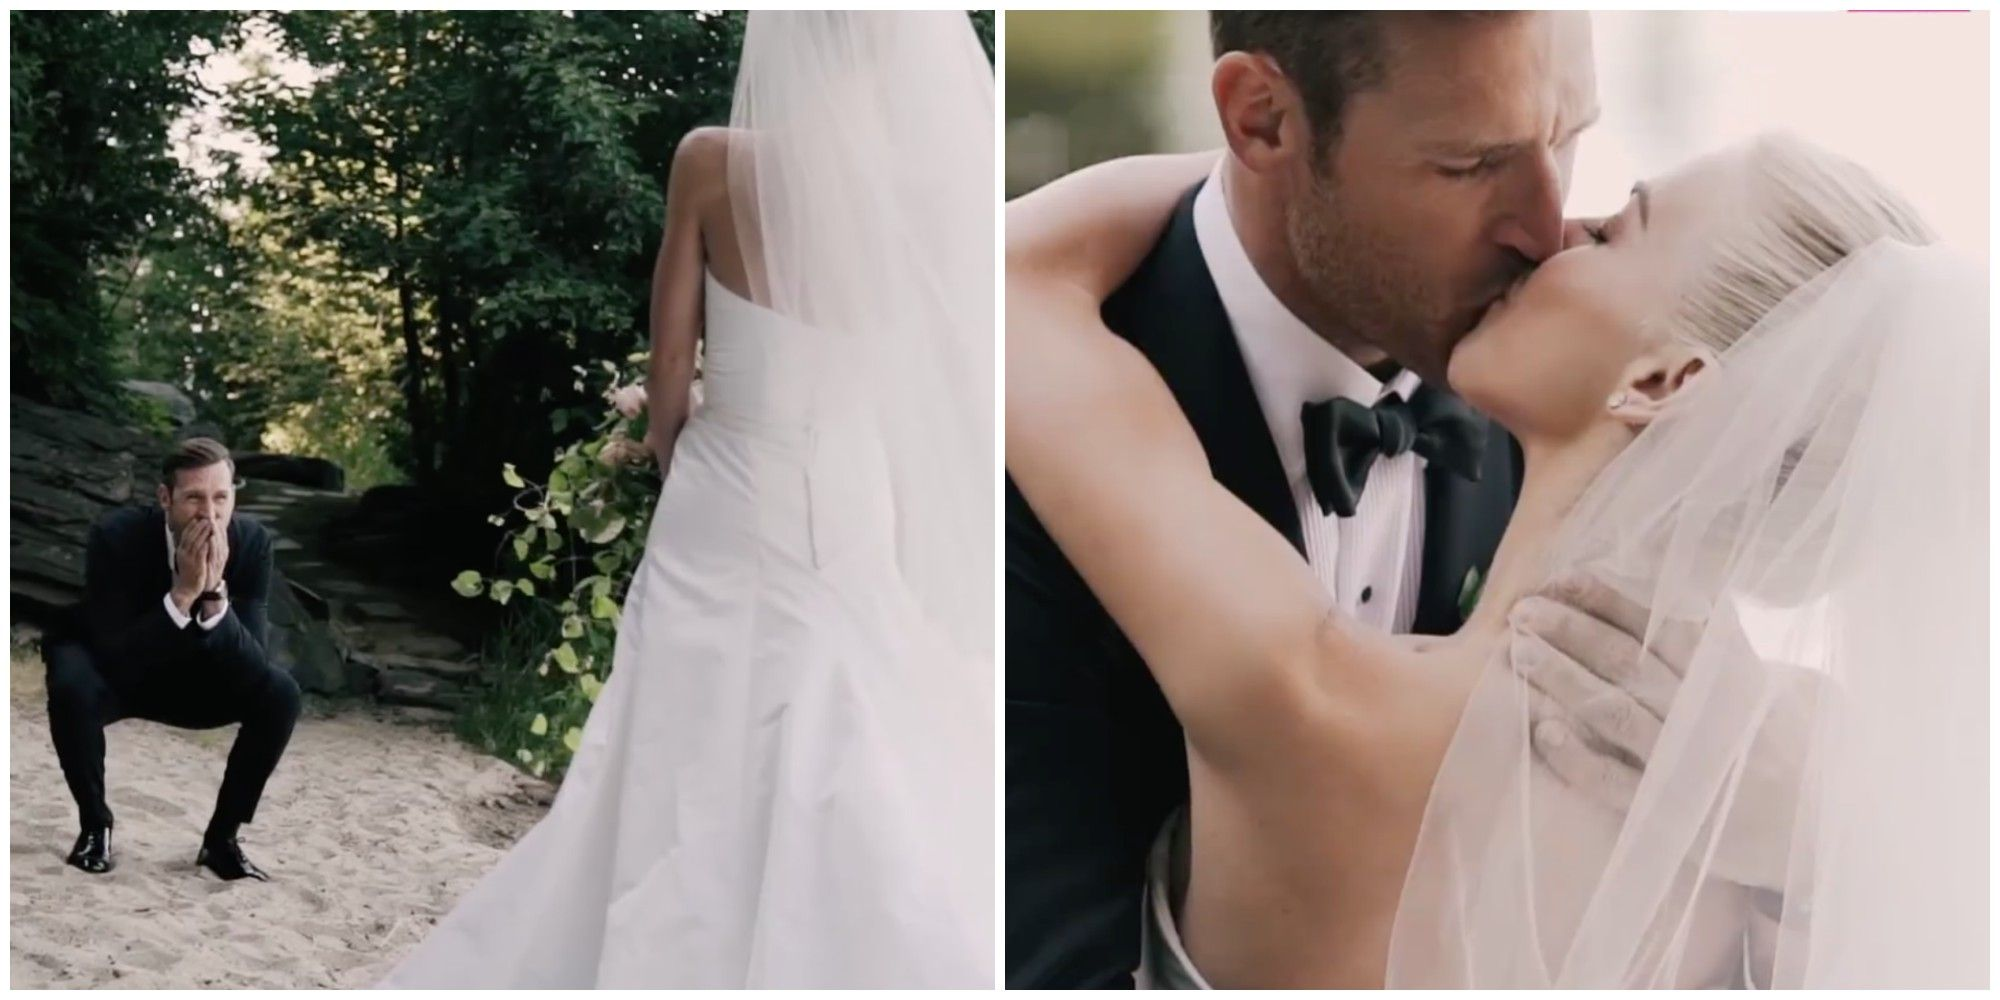 Julianne Hough Wedding Dress.Watch Julianne Hough S Groom React To Her Bride Look